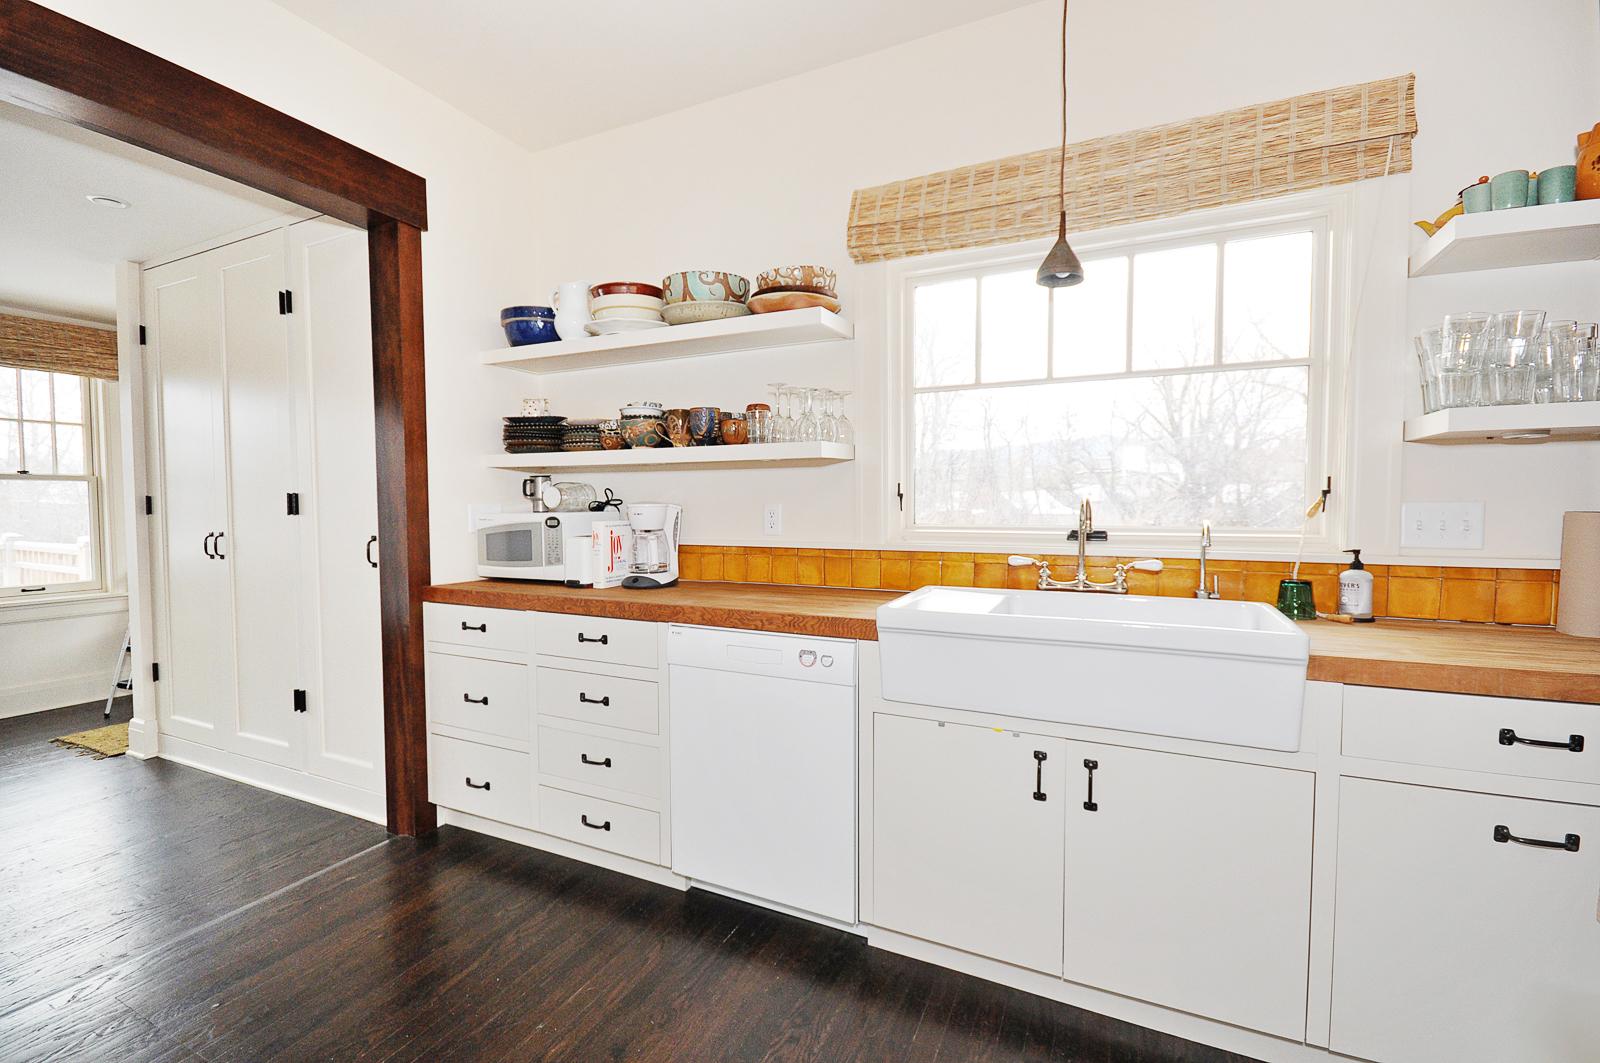 Woodworks-west-bozeman-montana-remodel-builders-carpentry-039.jpg